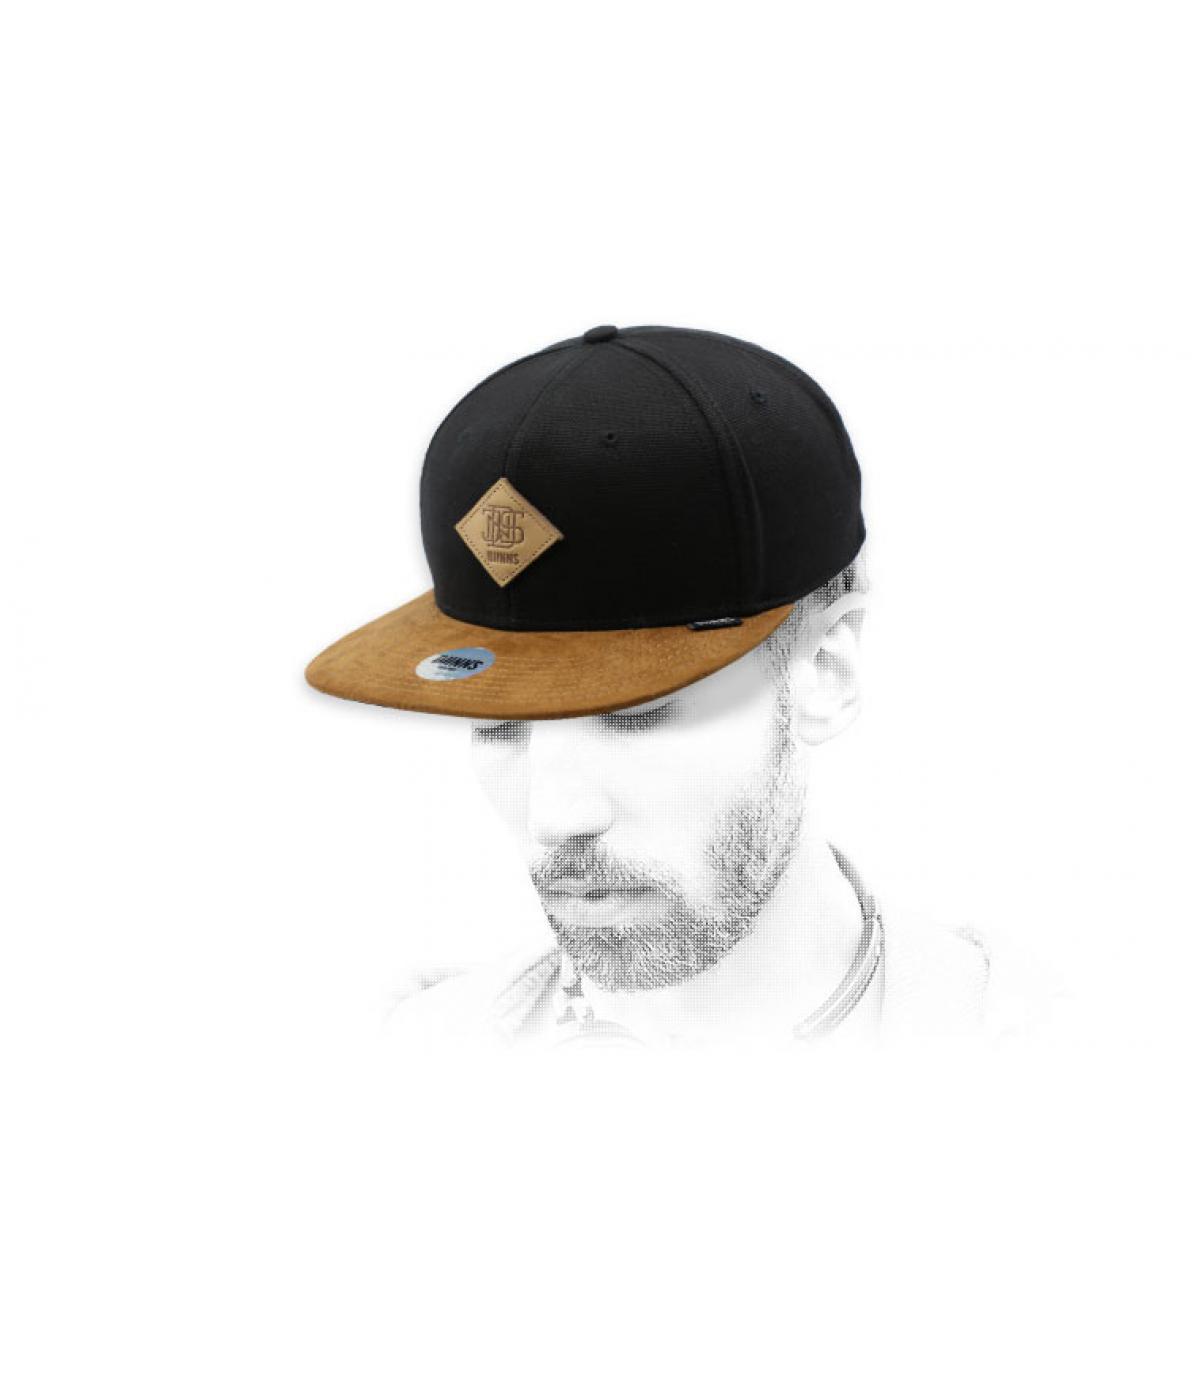 black suede snapback